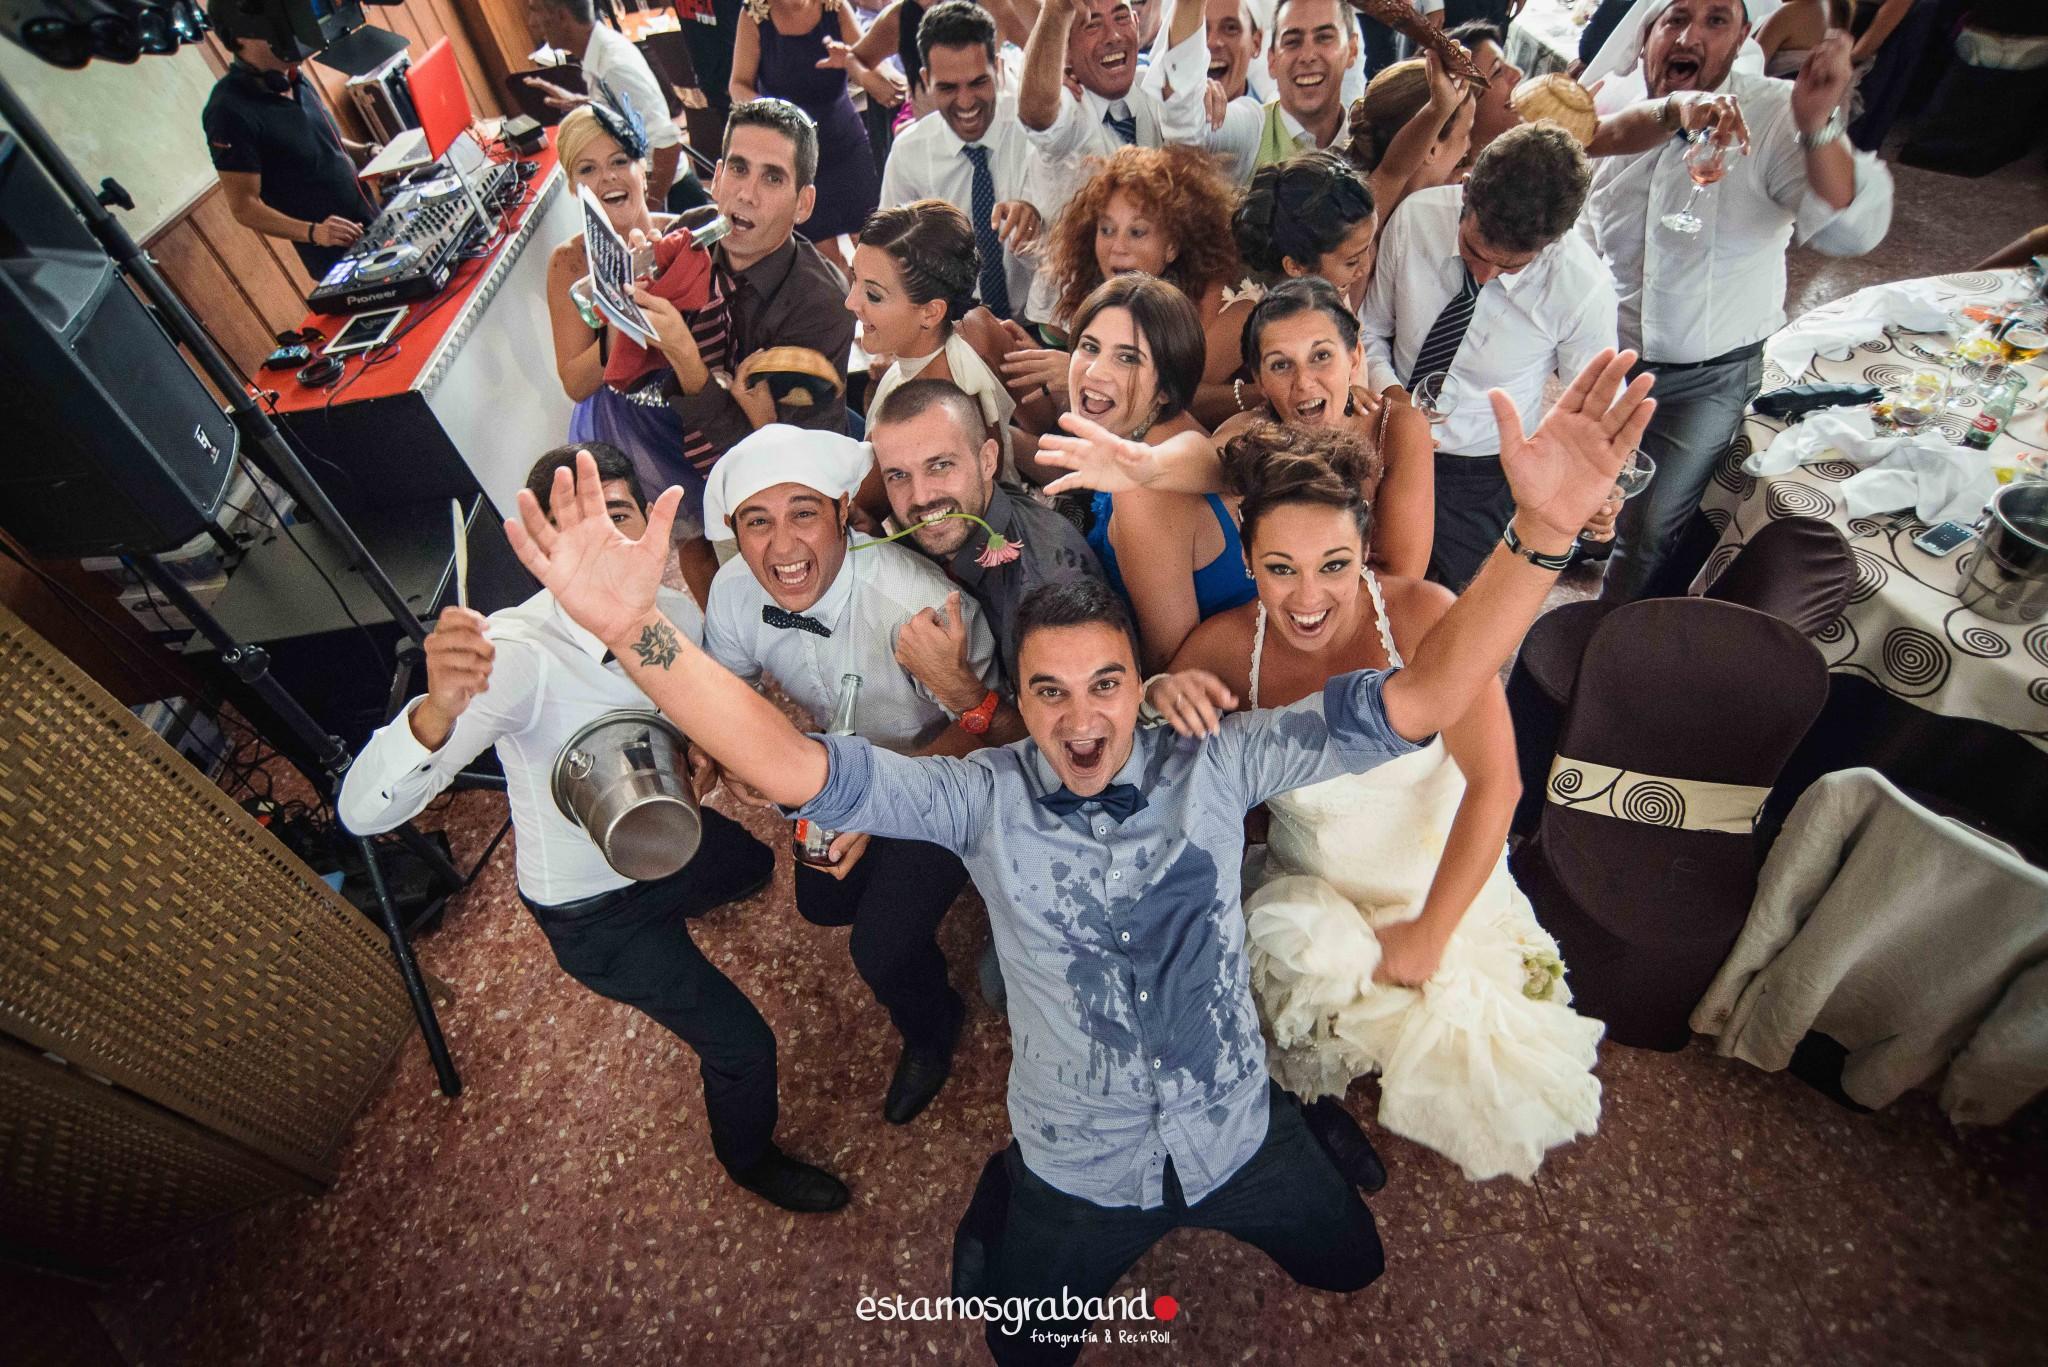 pili-y-jose_fotograficc81a-cadiz-88 Pili & Jose - video boda cadiz